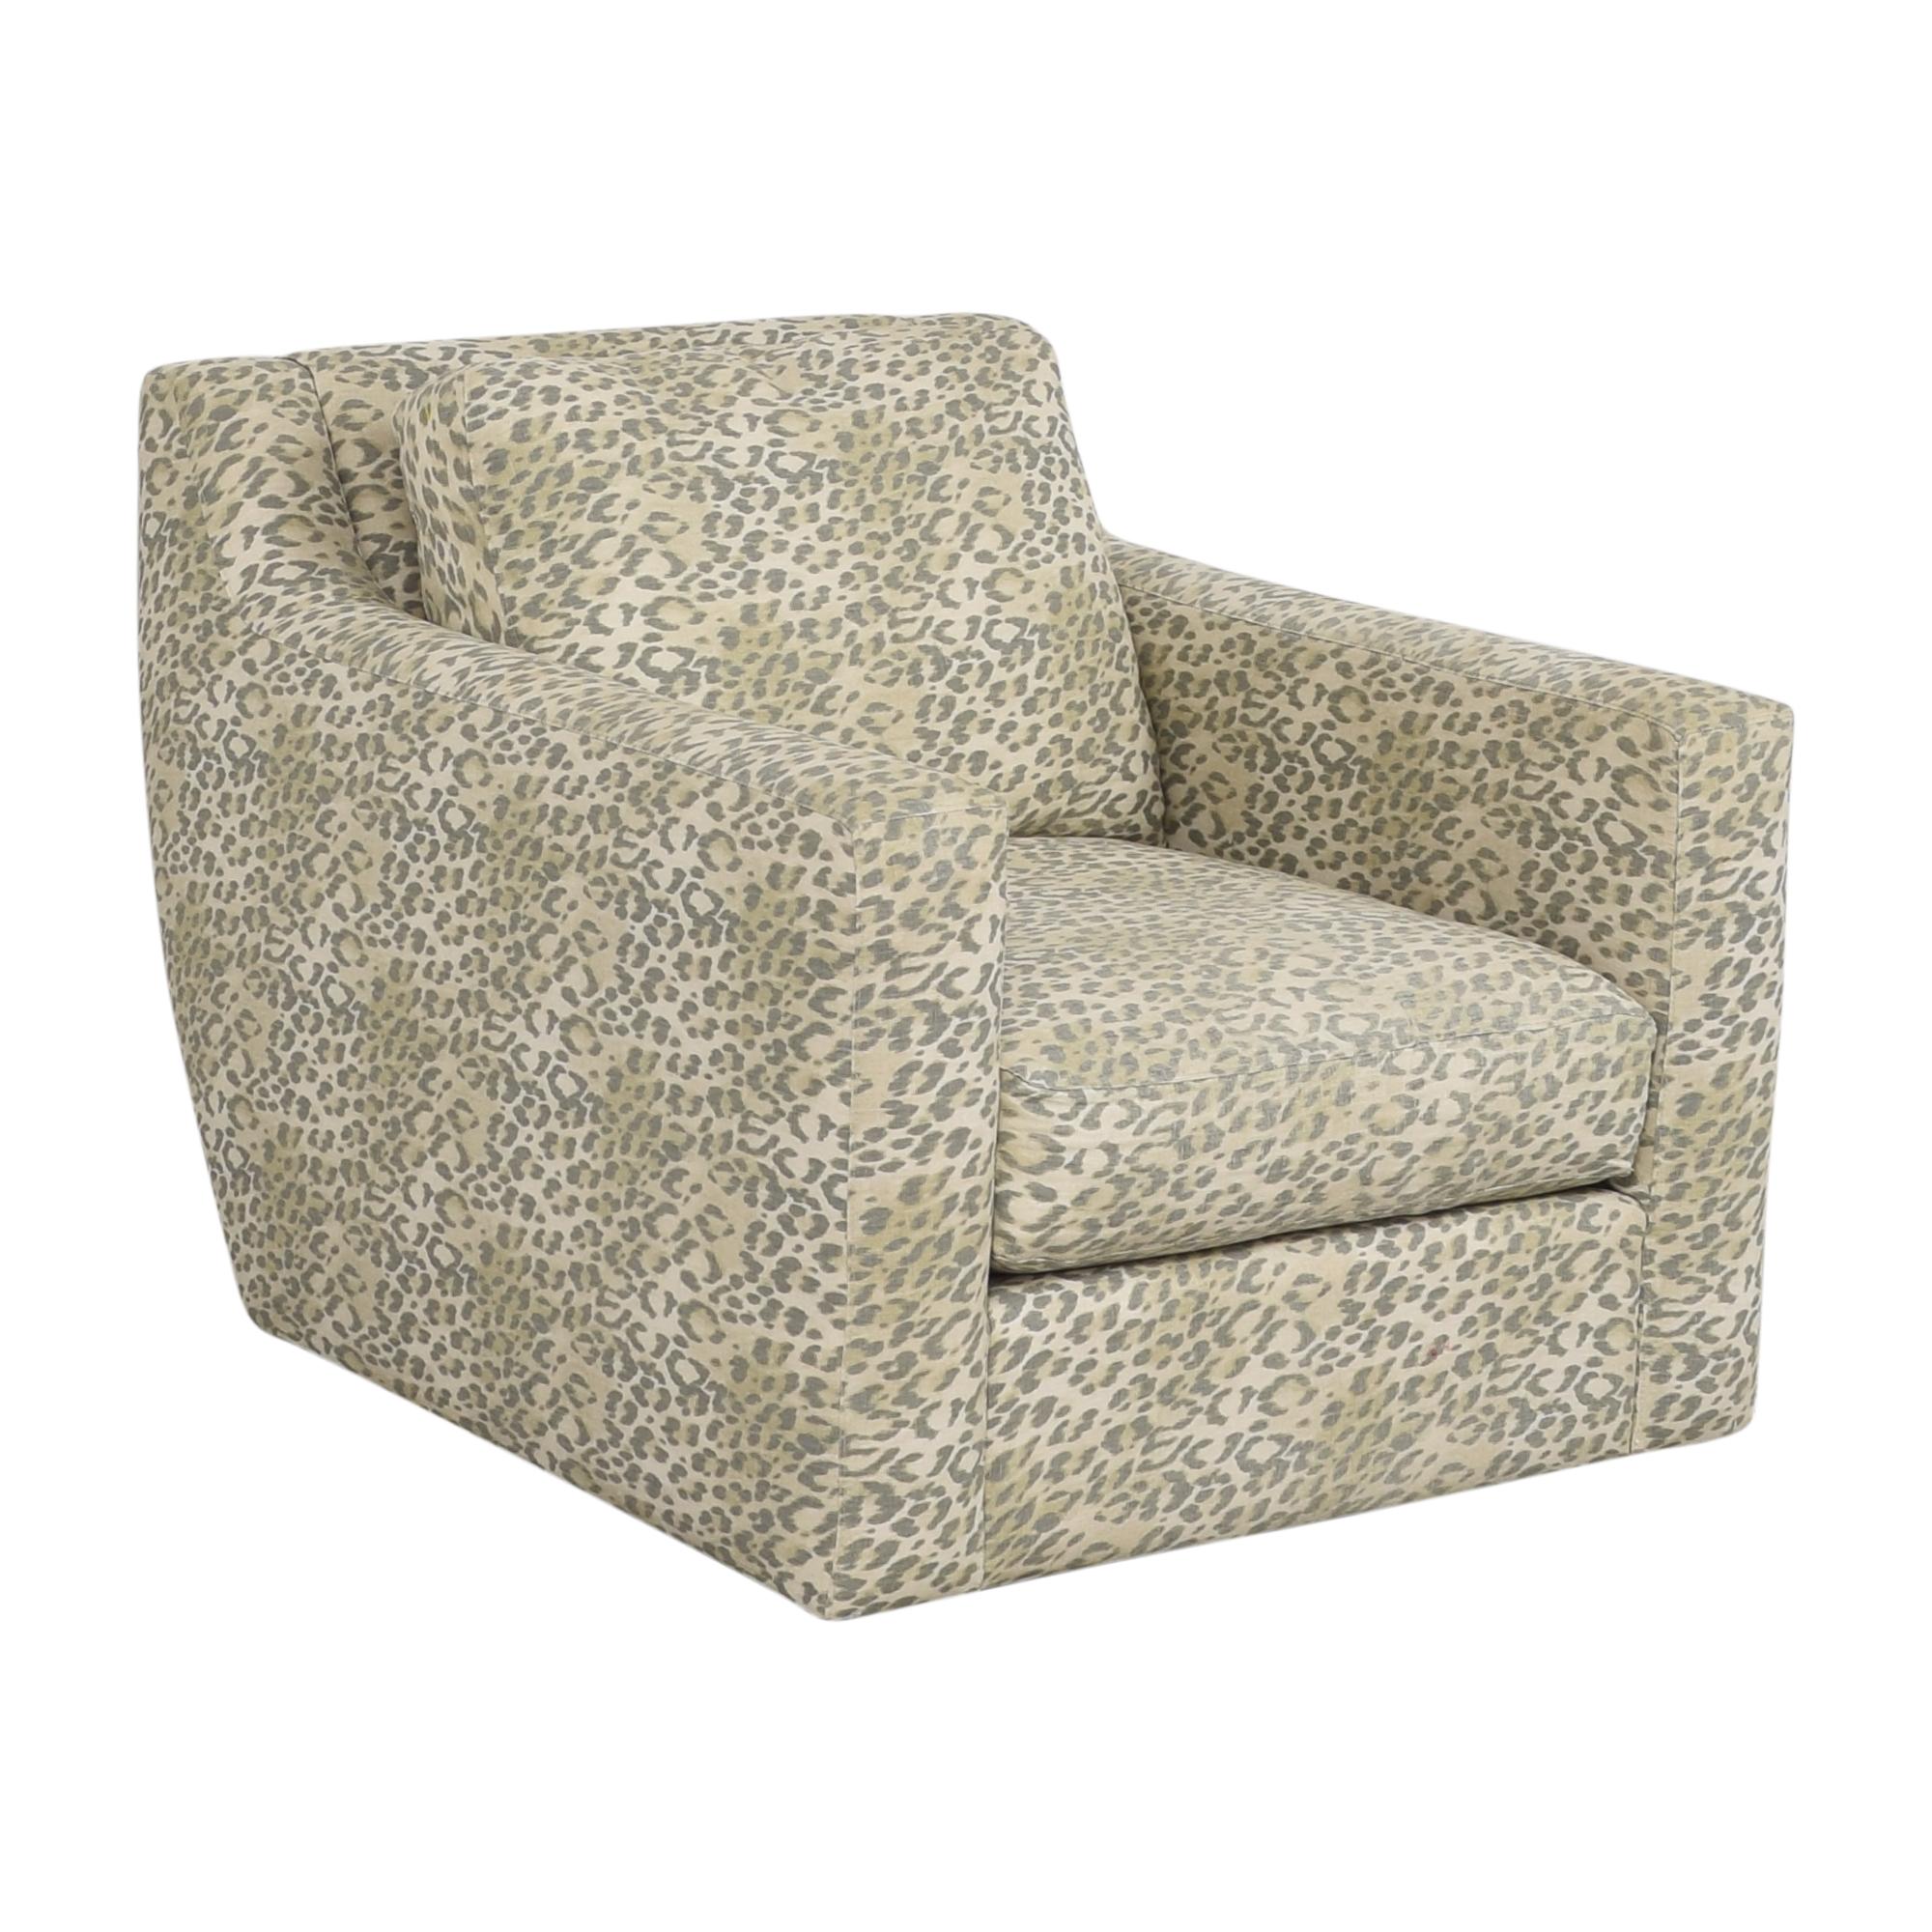 Lillian August Lillian August Swivel Chair